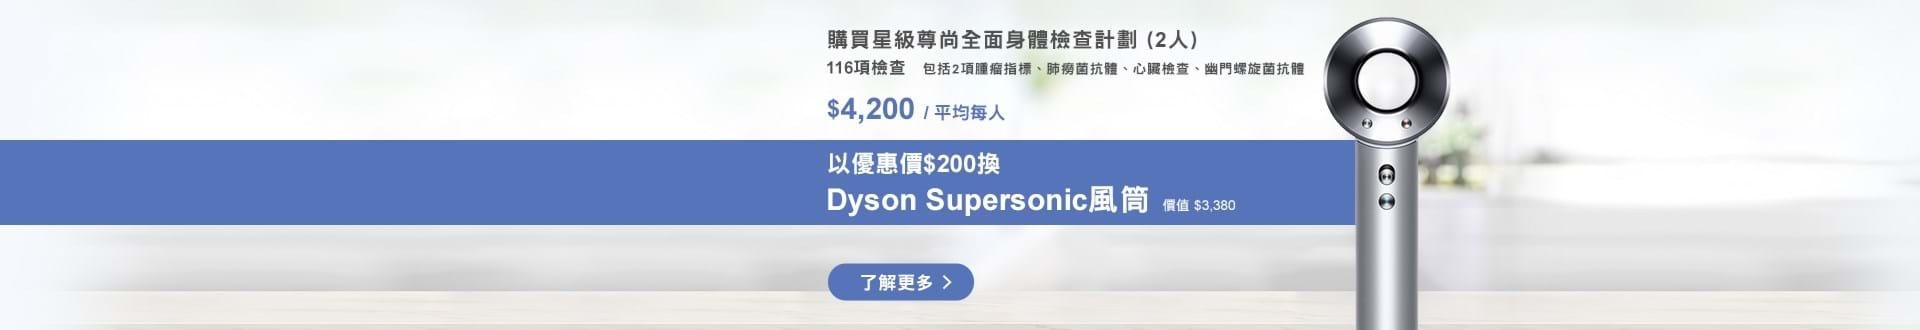 1Mar_DysonSupersonic